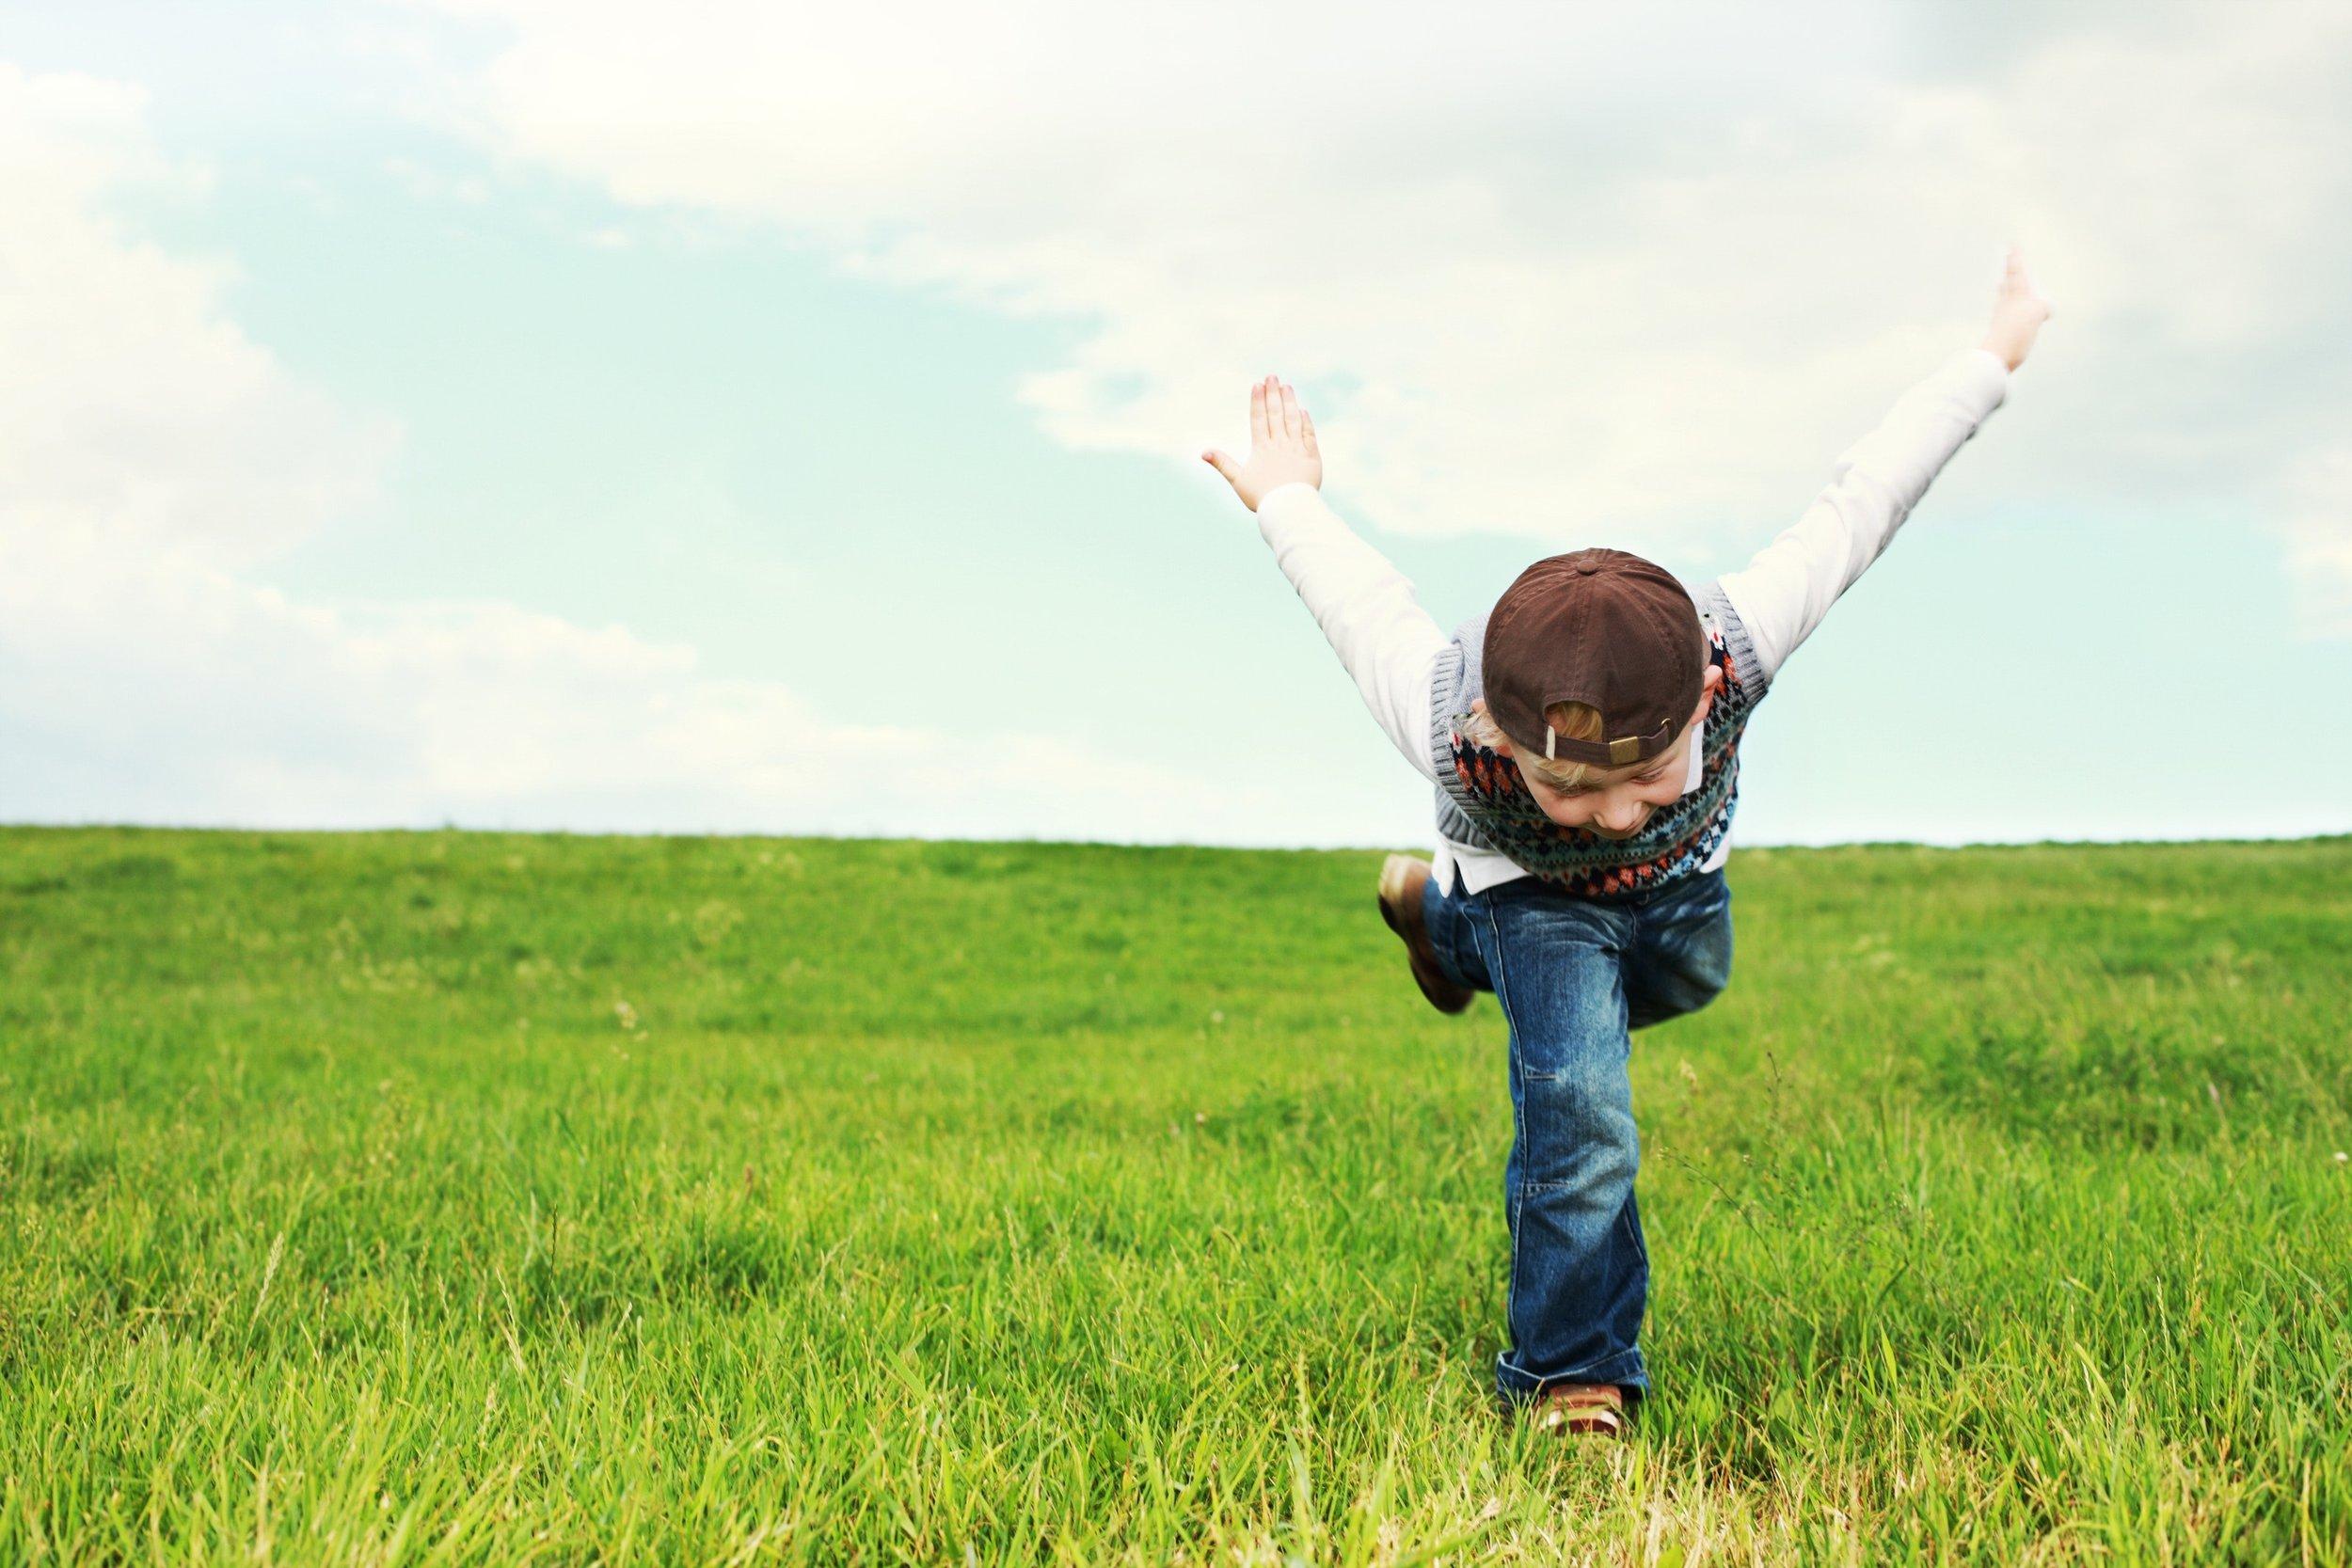 carefree-child-childhood-259704.jpg